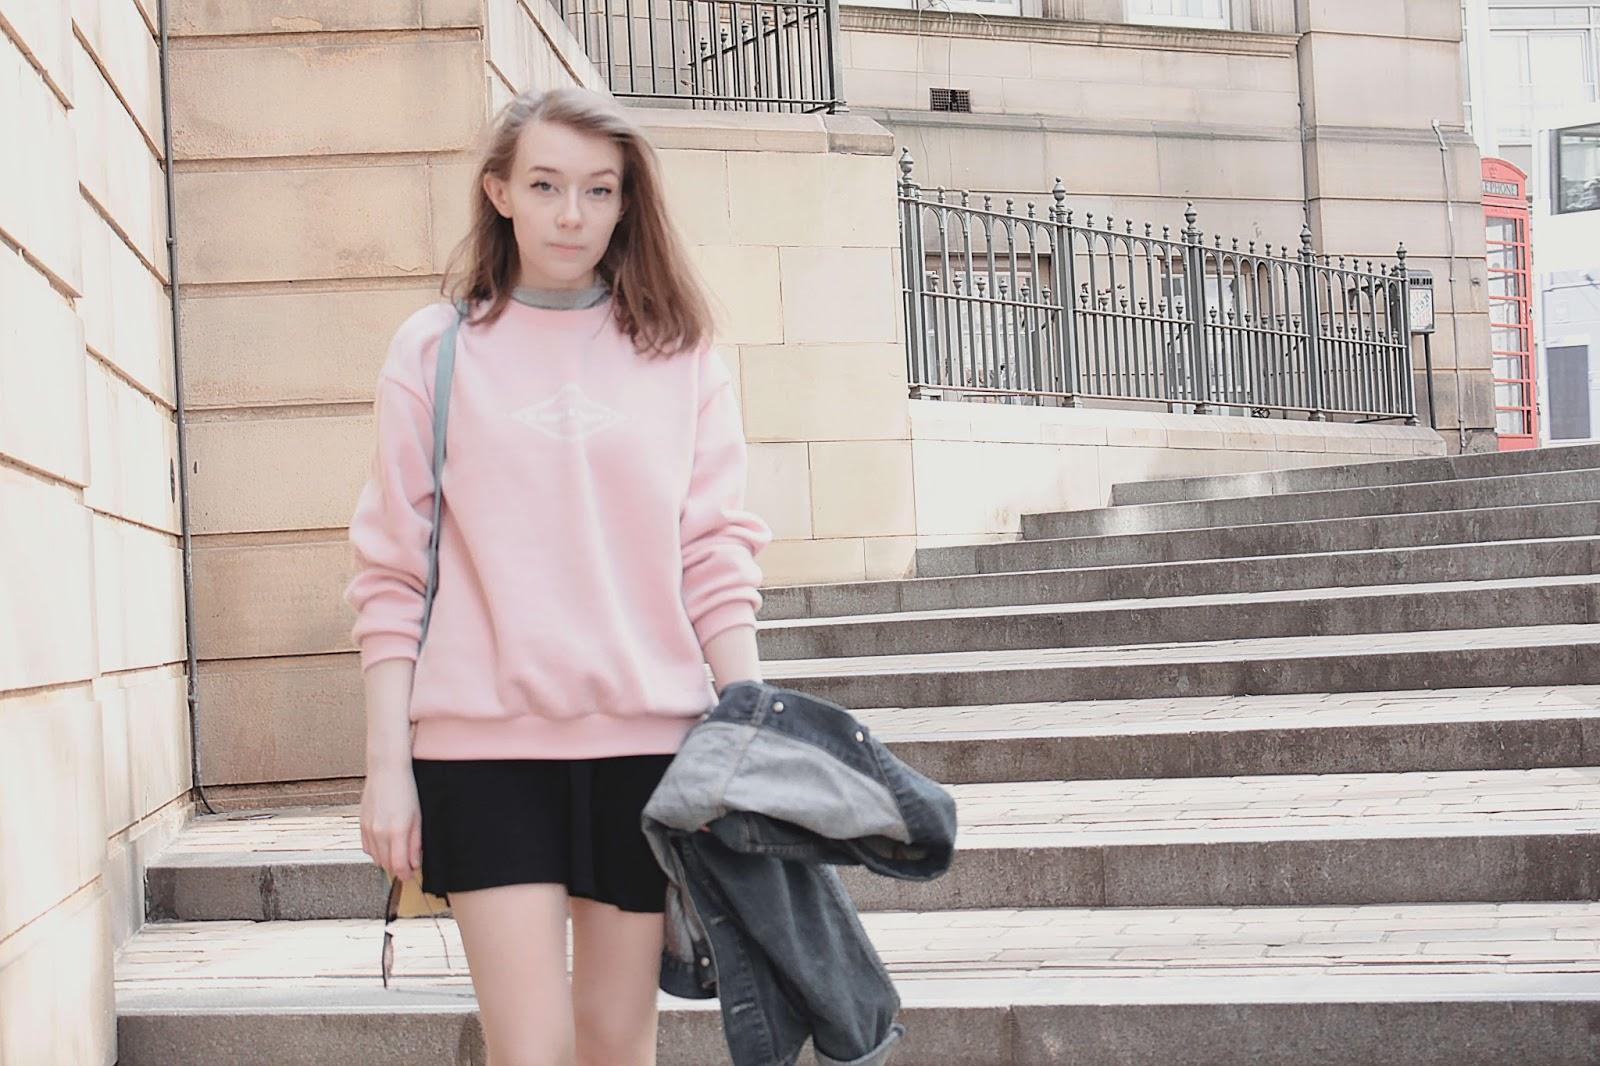 uk fashion blogger ootd inspiration little miss fii korean fashion ideas